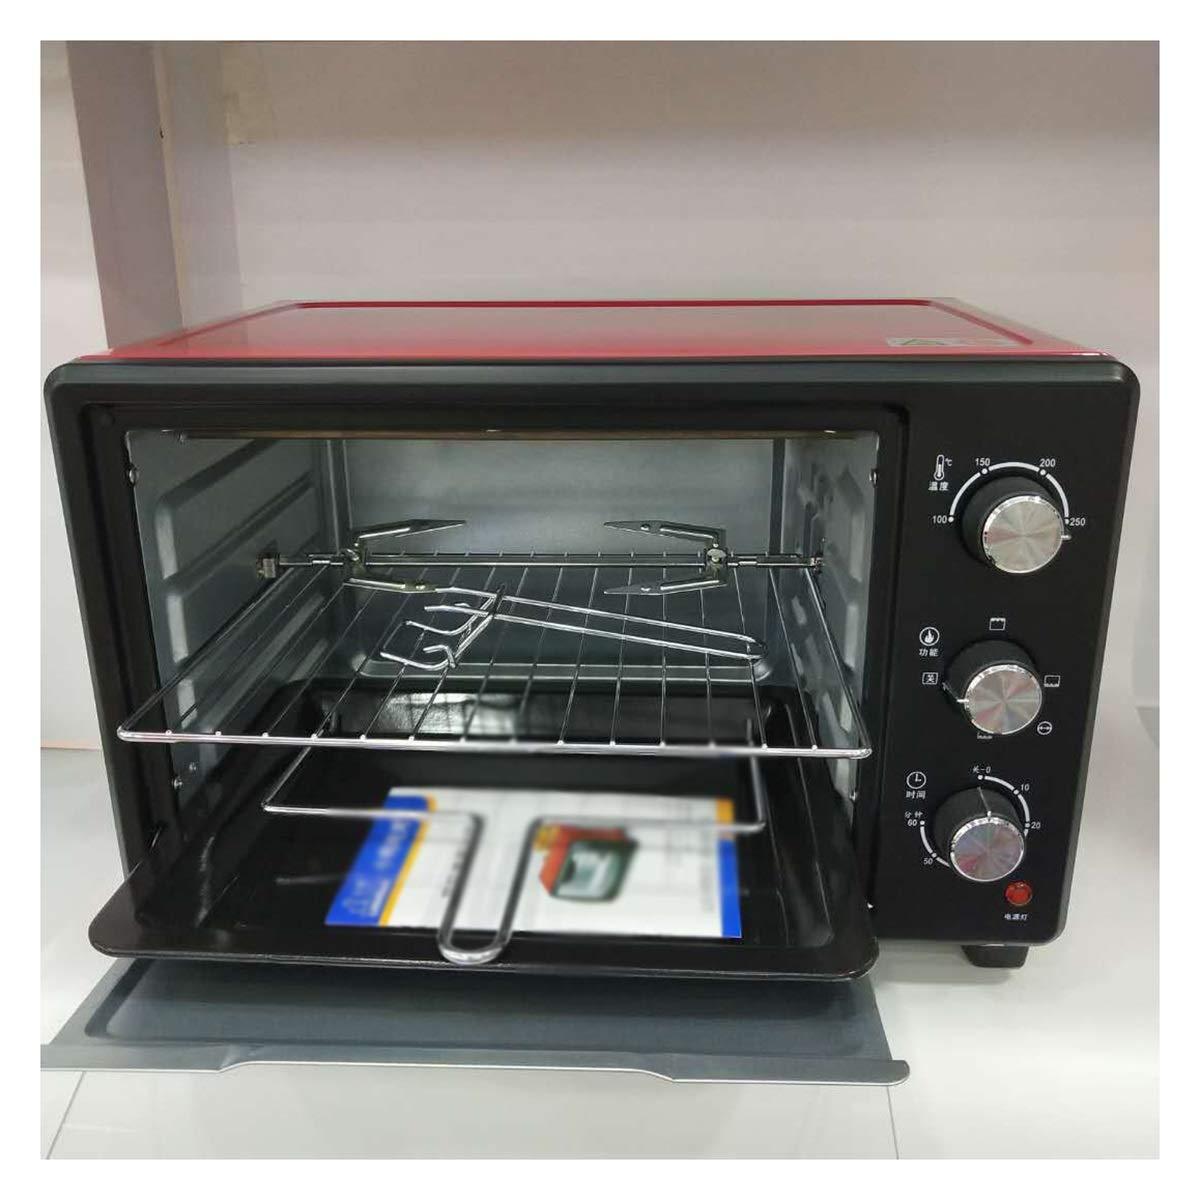 PANGU-ZC ミニオーブン - 多層オーブンオーブン焙煎位置調整可能なミニオーブン30 L回転フォーク家庭用オーブン -オーブン   B07R56J4PB